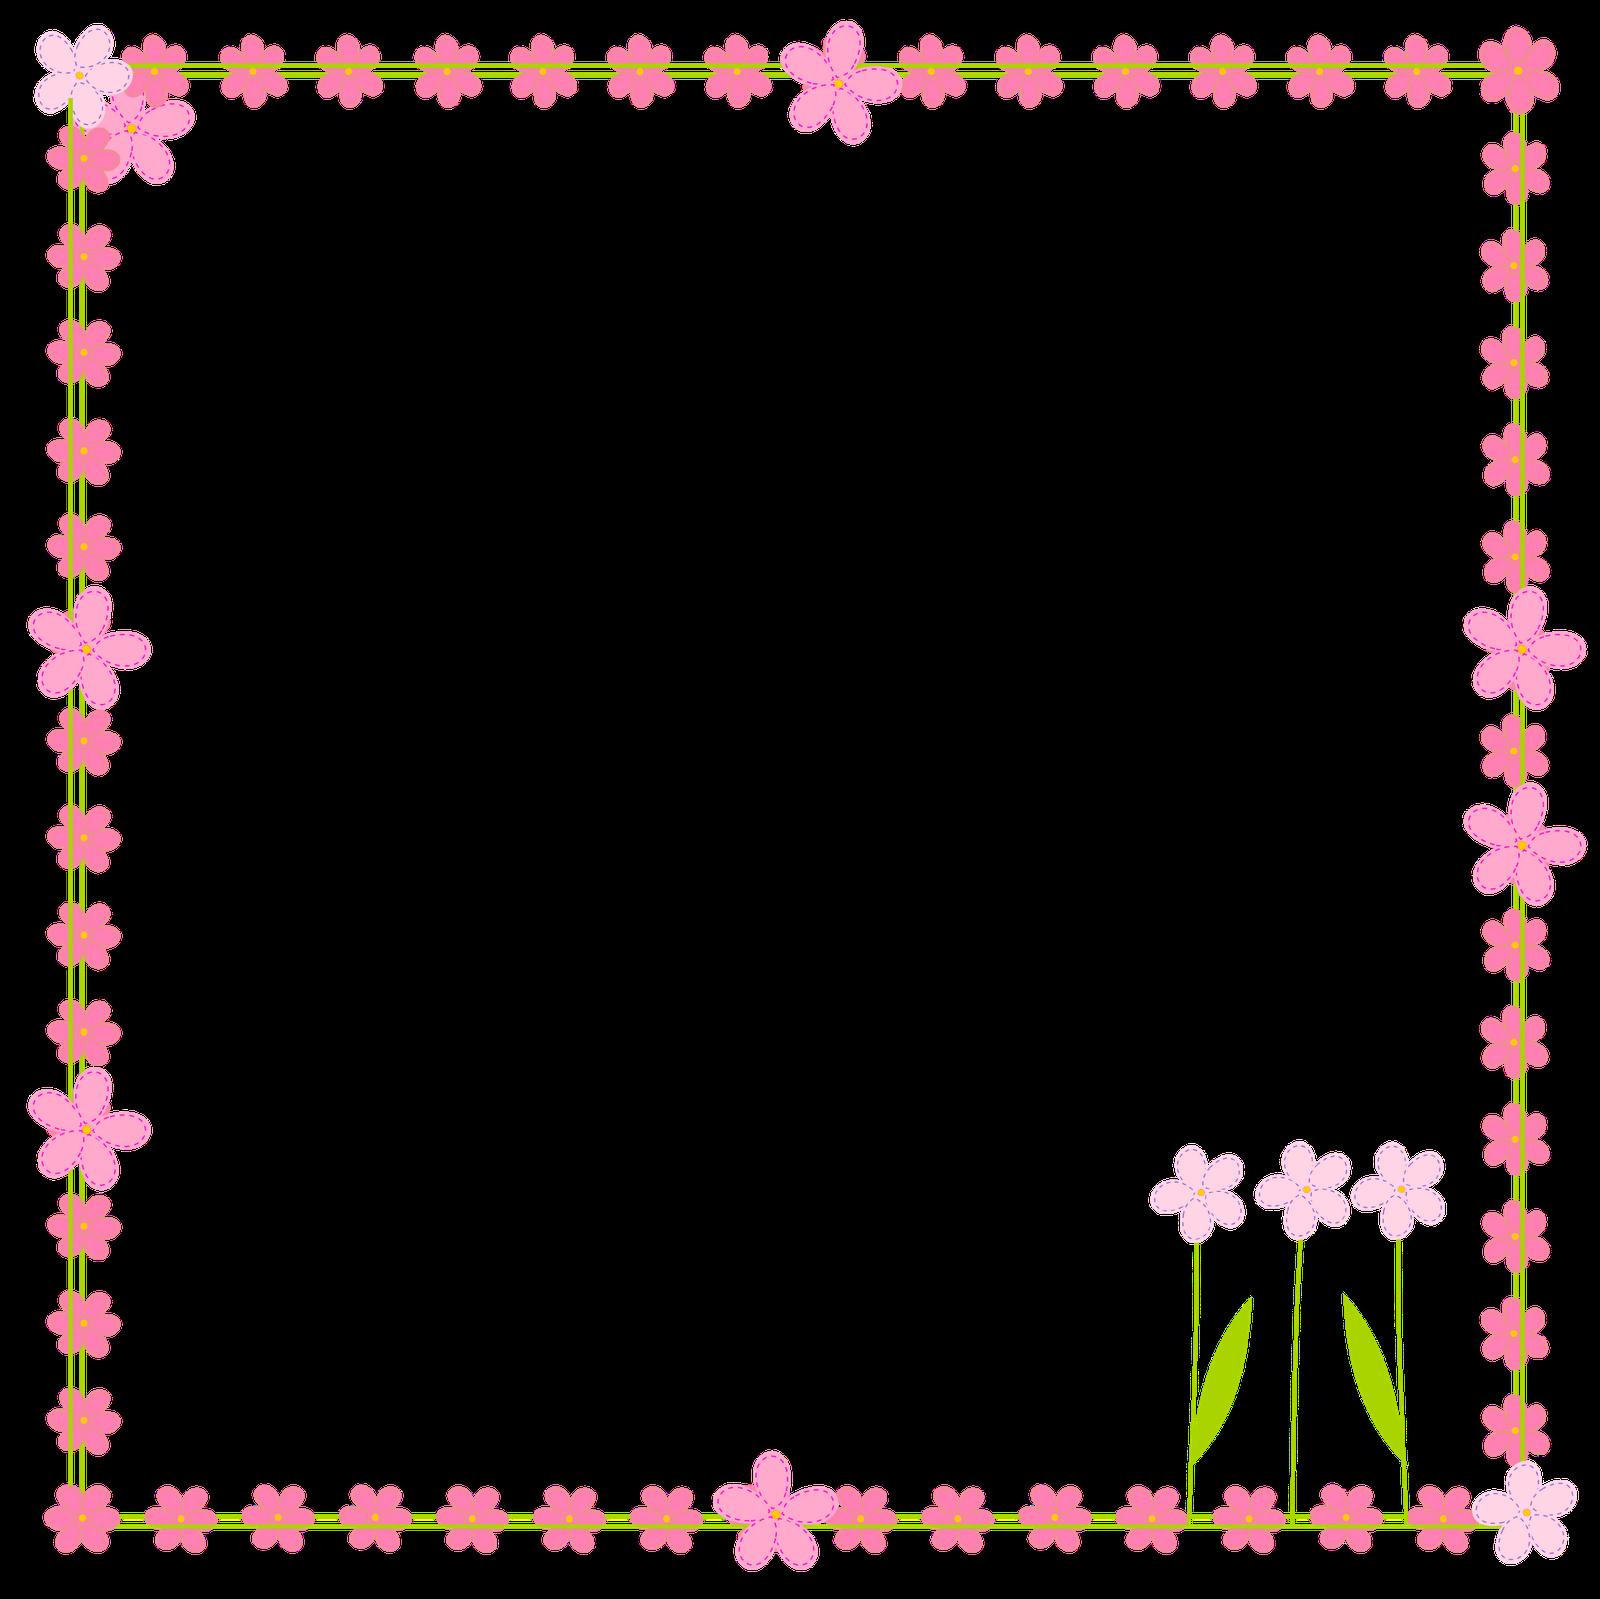 1600x1599 Flowers Border Clipart